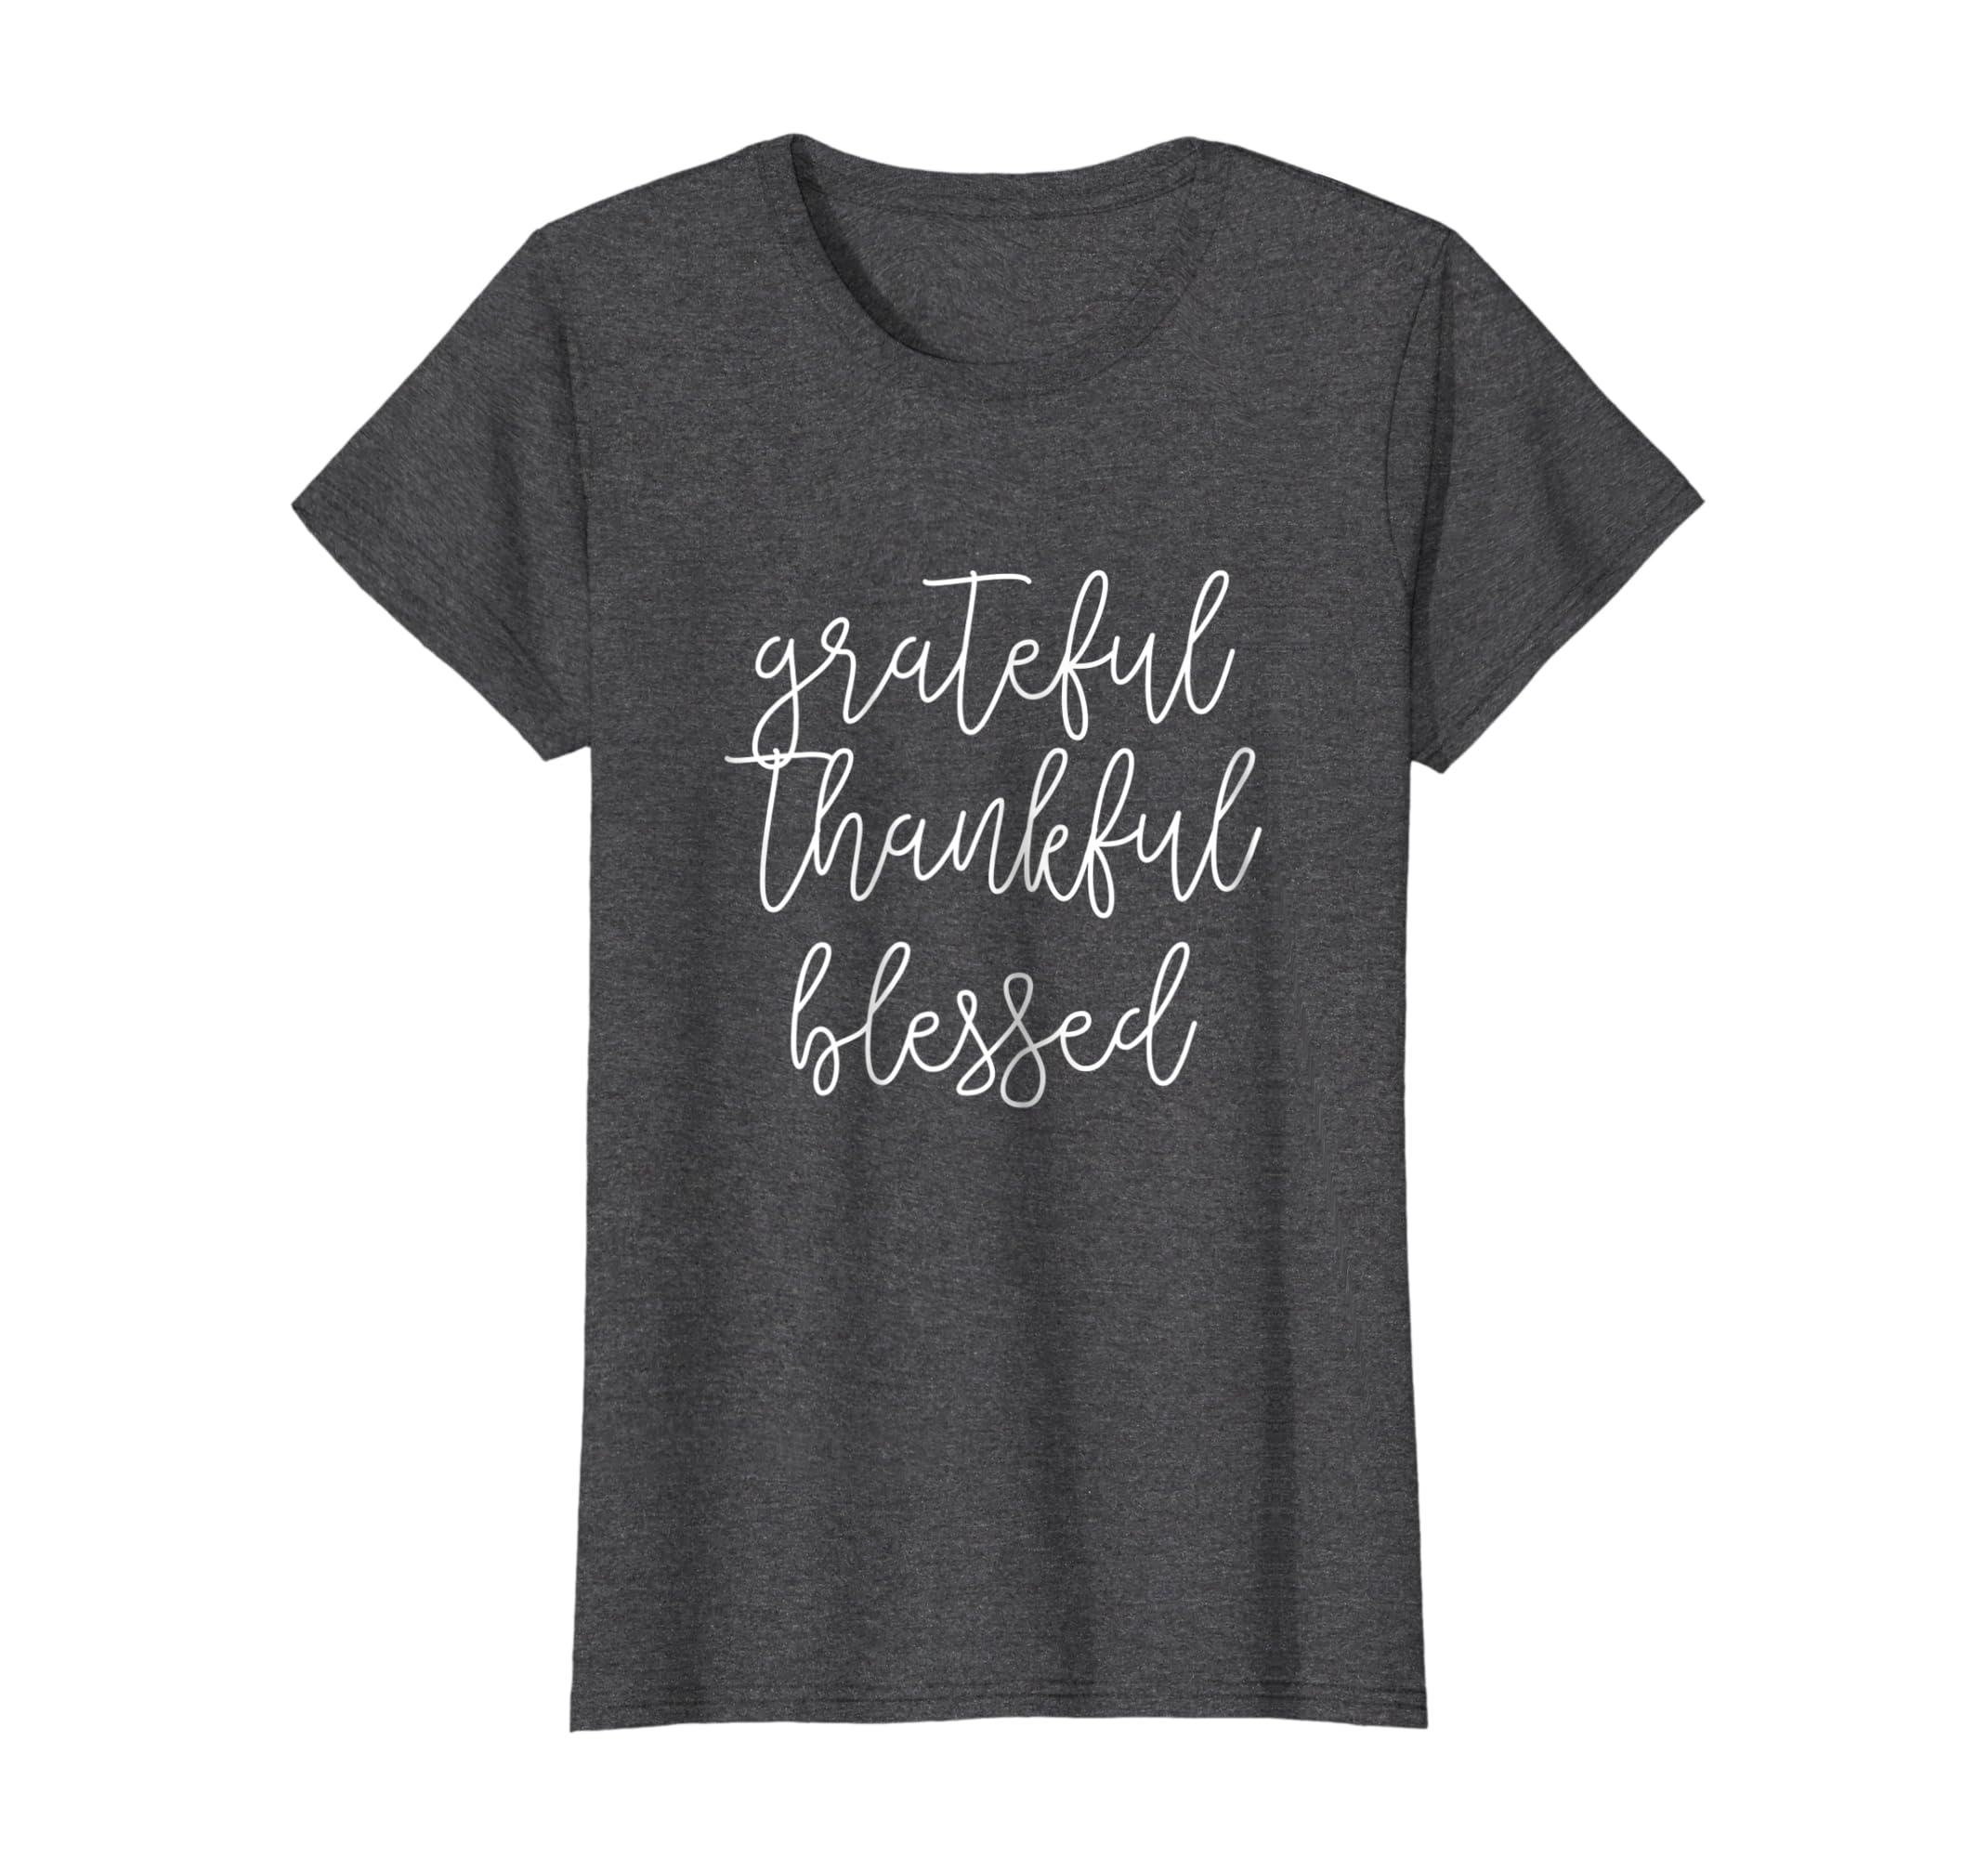 Grateful Thankful Blessed T Shirt Ladies-Bawle